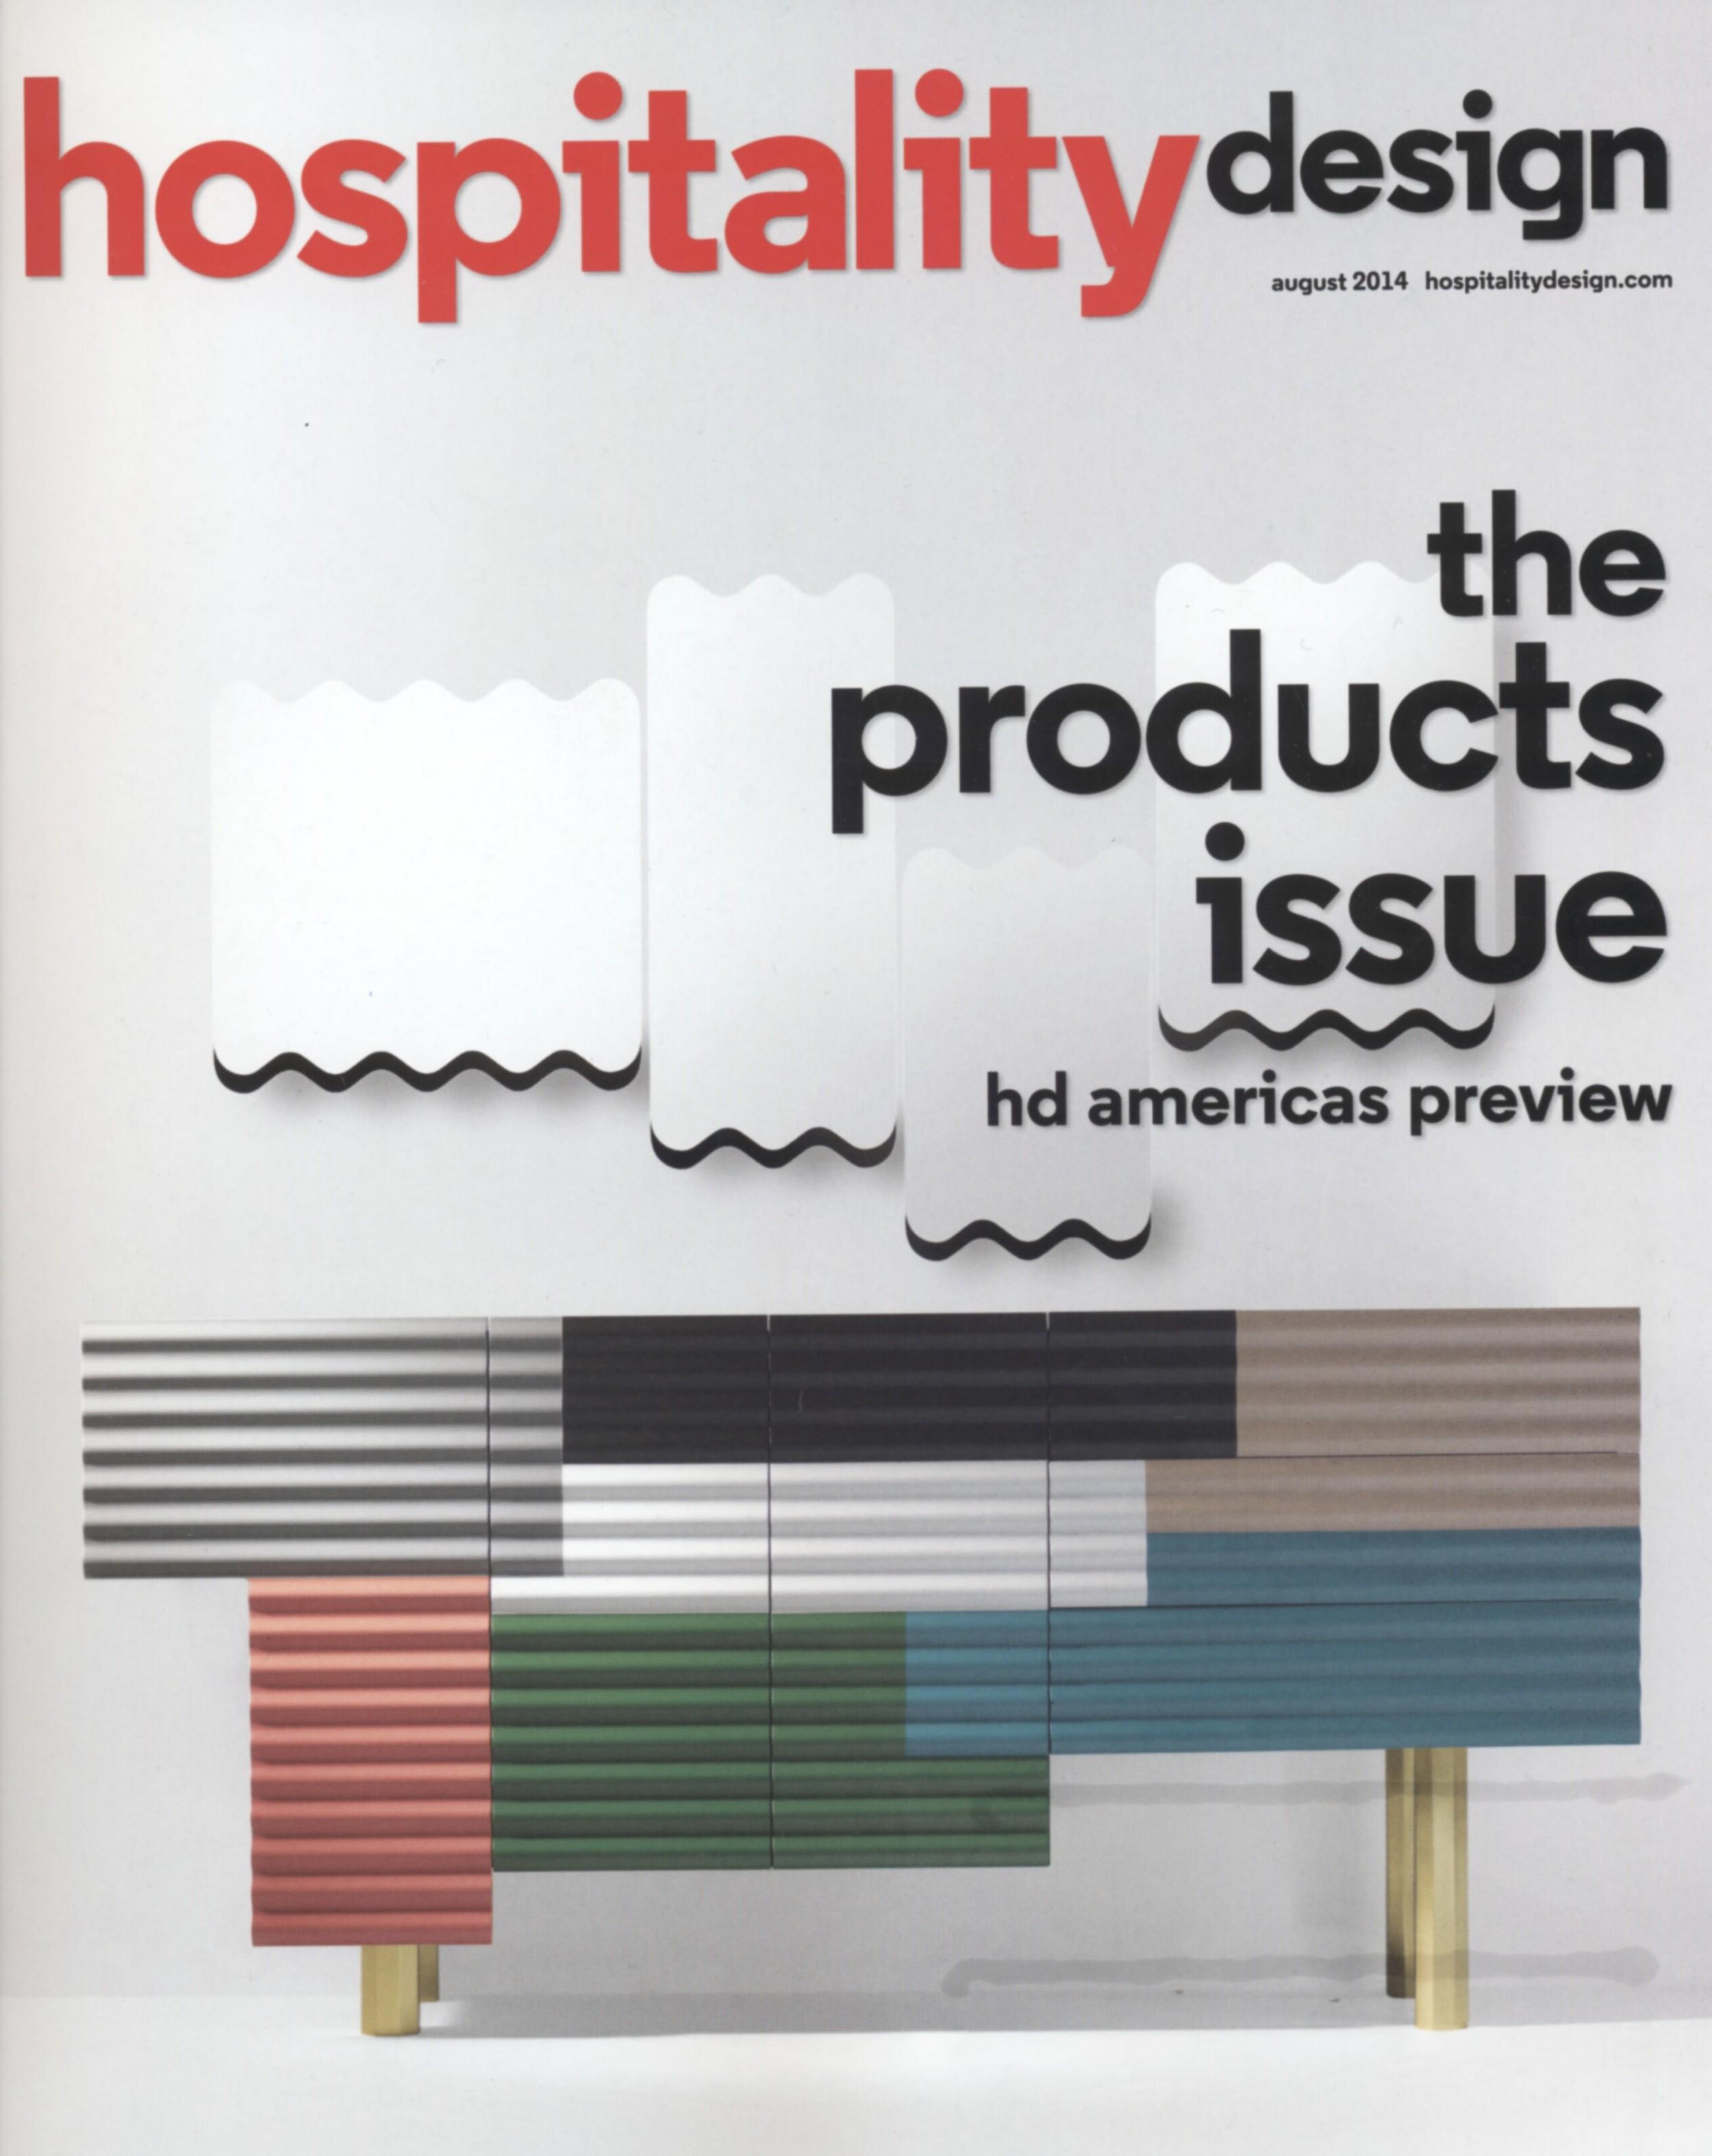 HOSPITALITY DESIGN AUGUST 2014